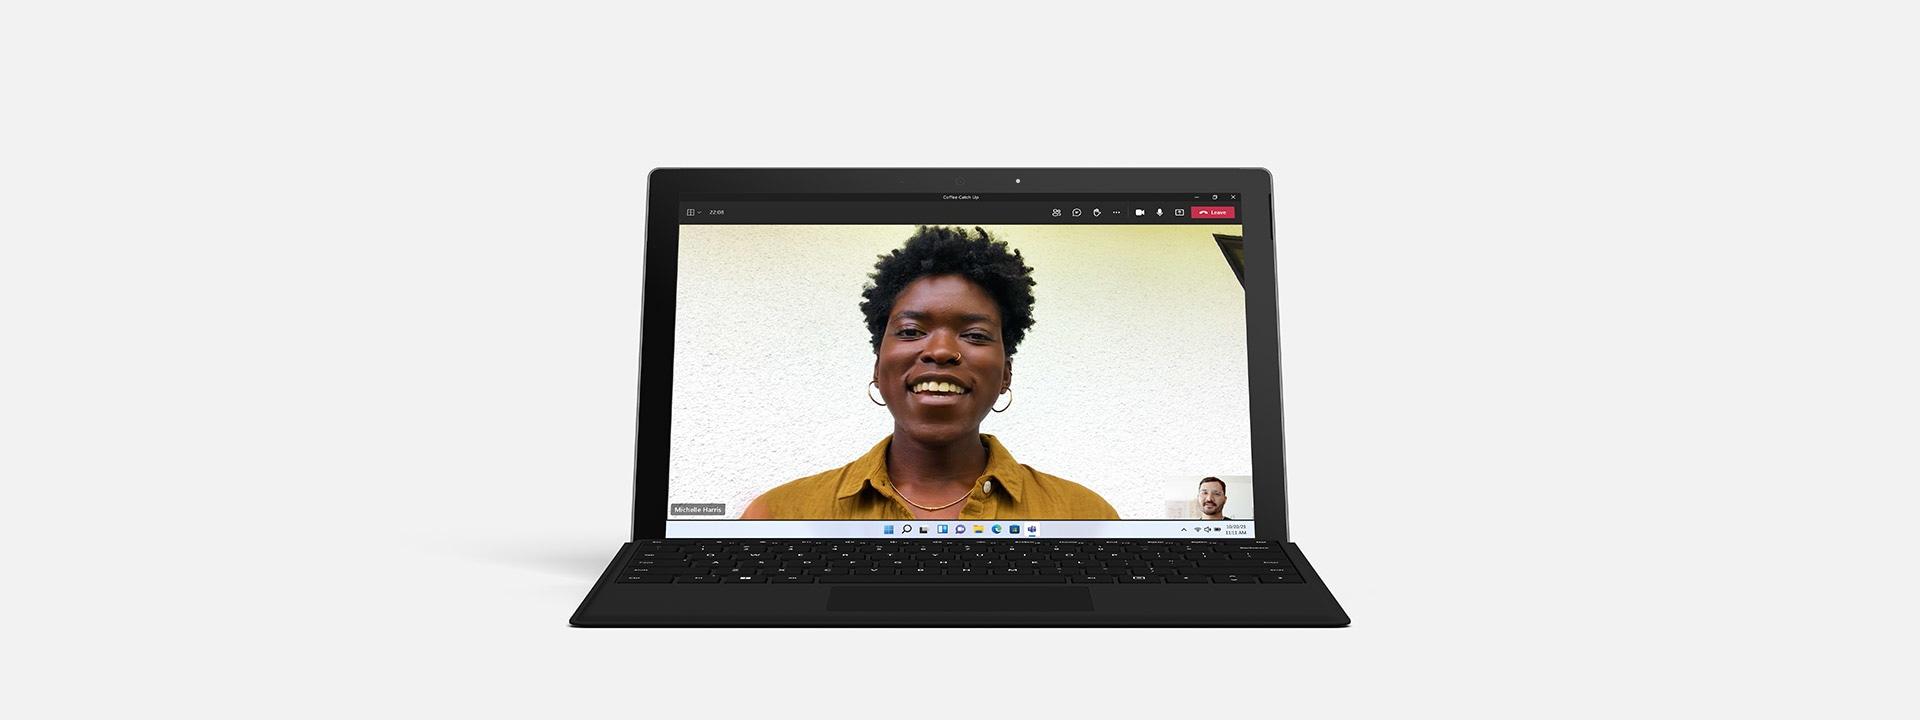 Device shown as laptop.